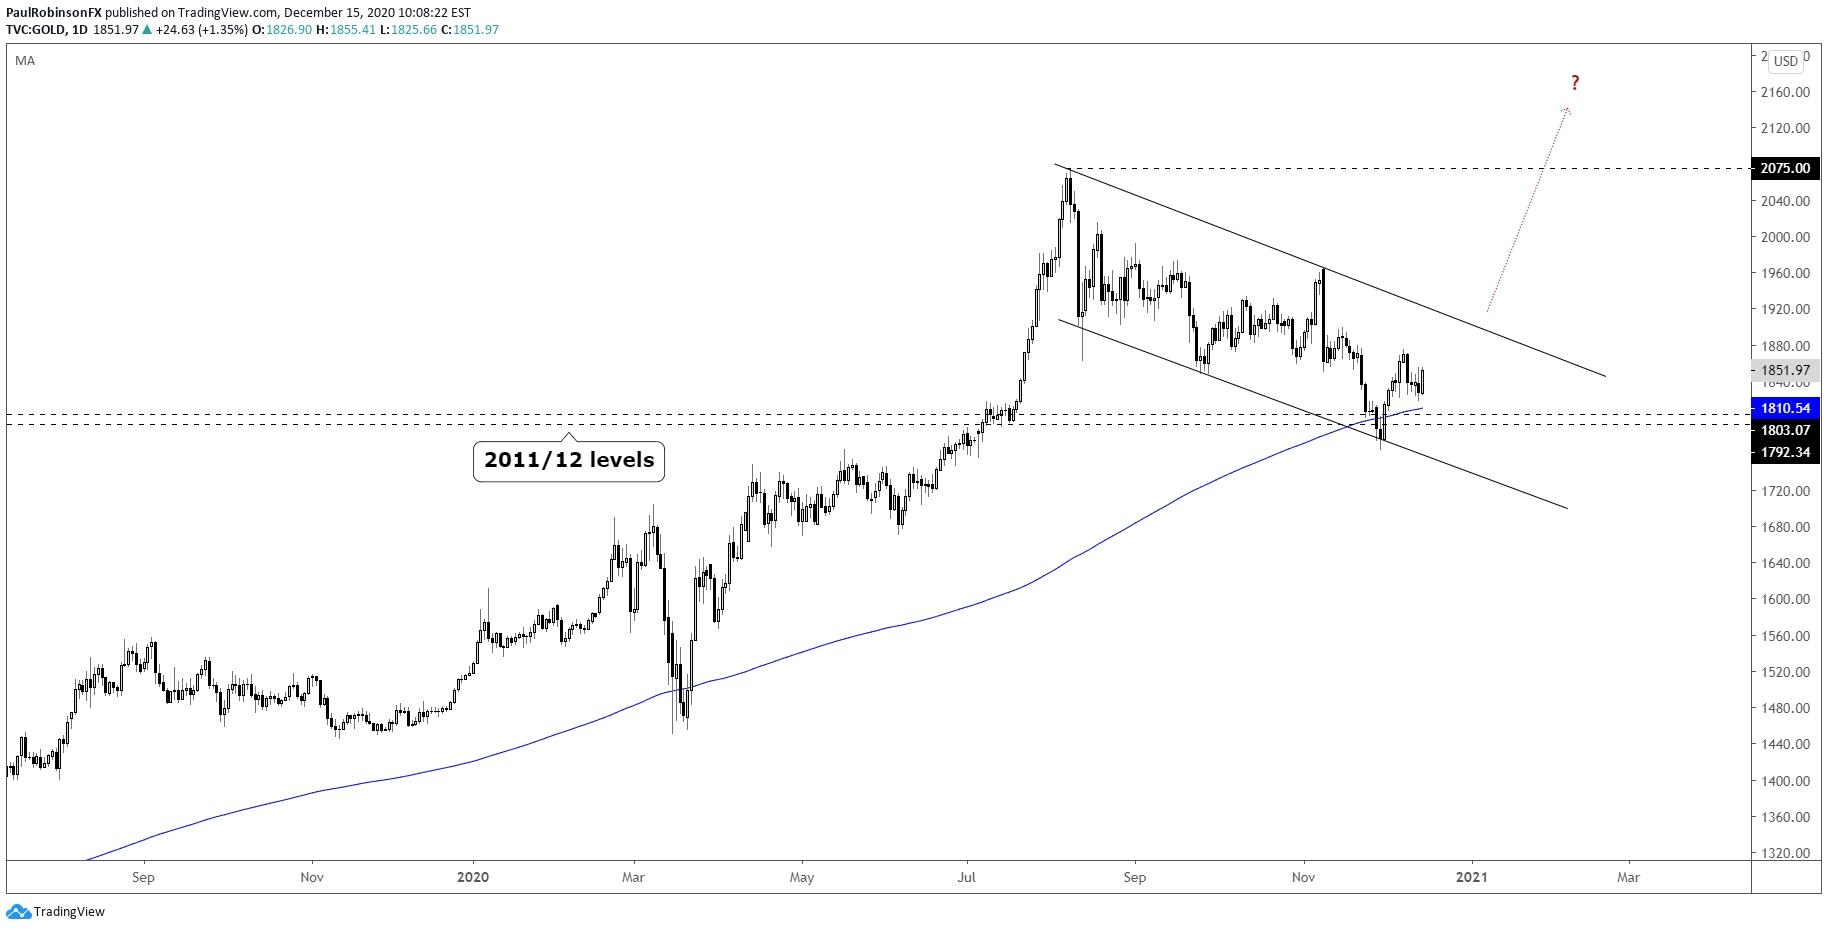 Gold 1Q 2021 Forecast: Gold Outlook Bullish Headed Into